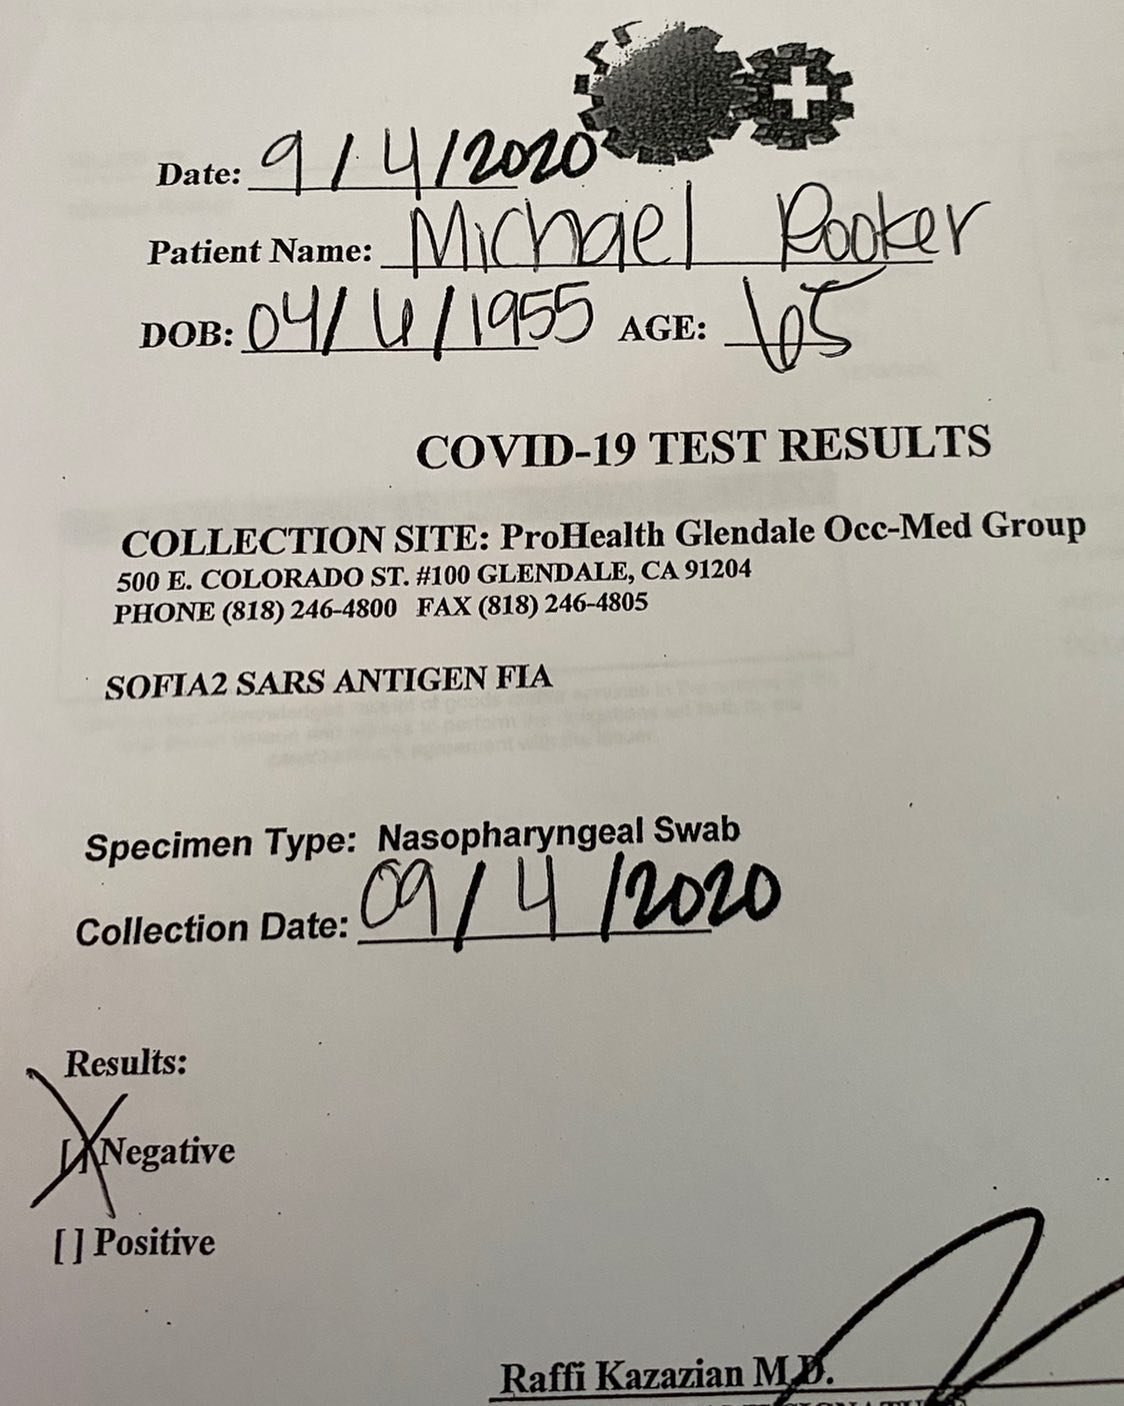 resultado do teste de COVID-19 de Michael Rooker